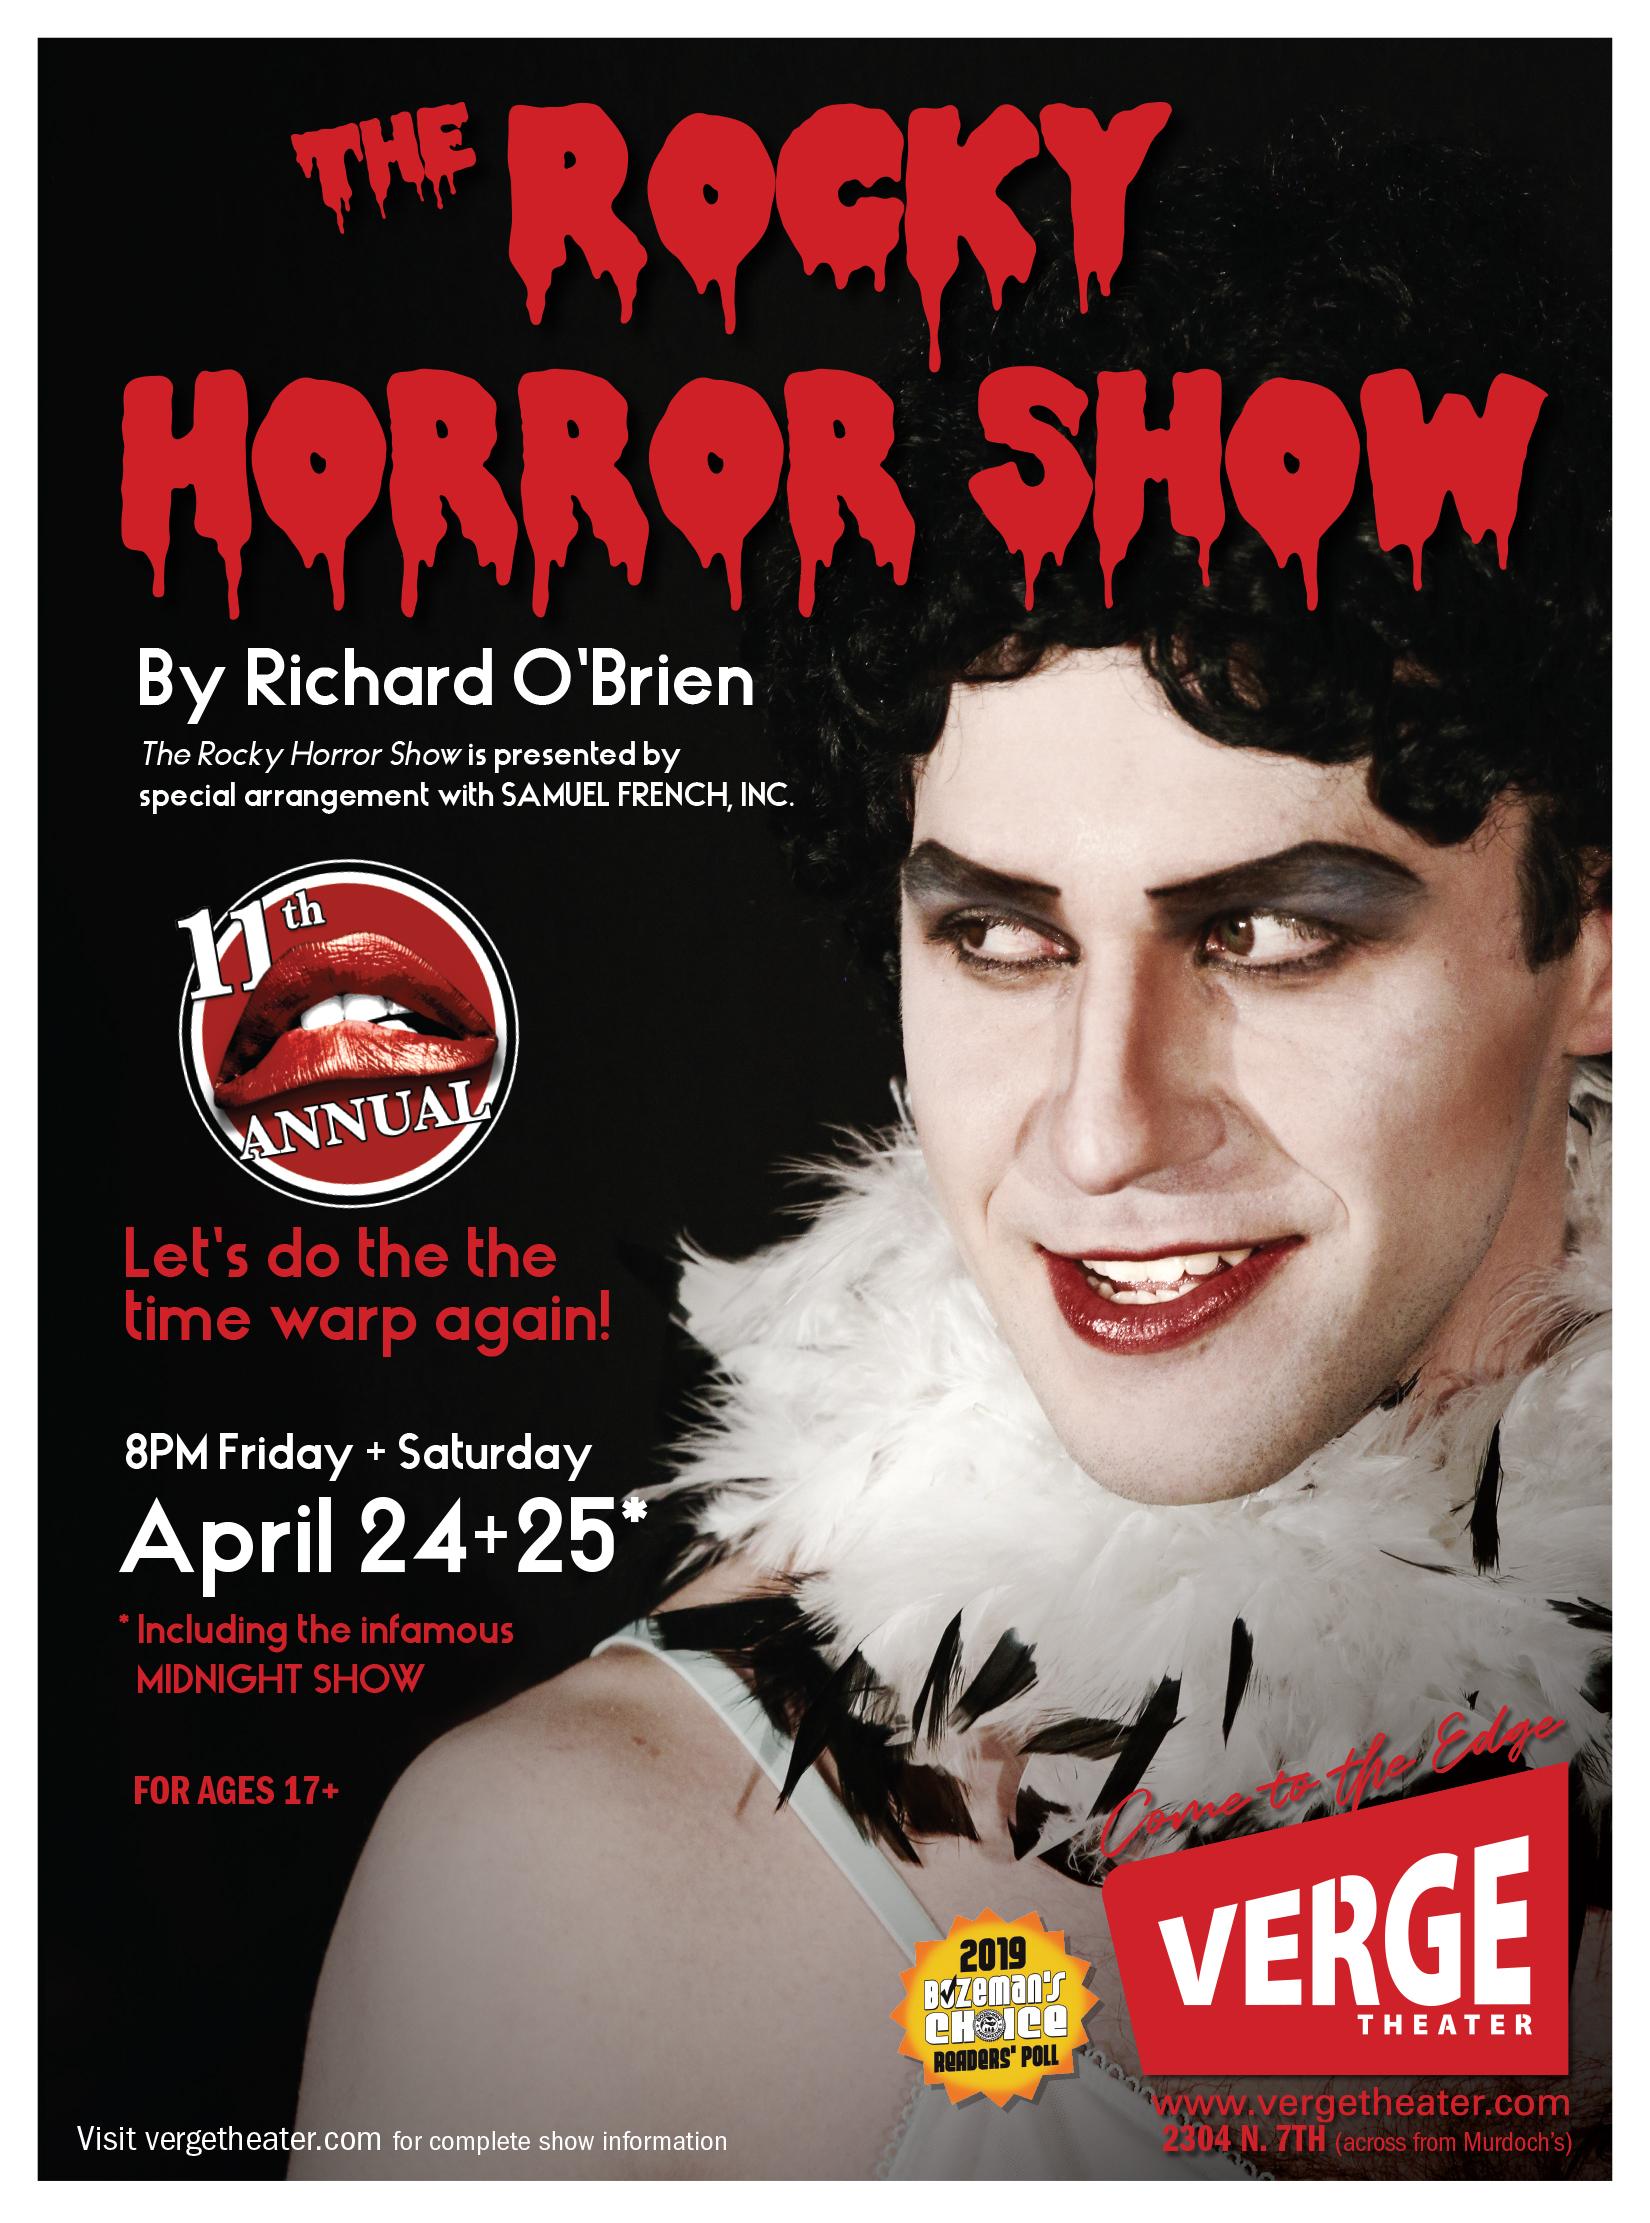 The Rocky Horror Show Poster 11 x 17 for website.jpg